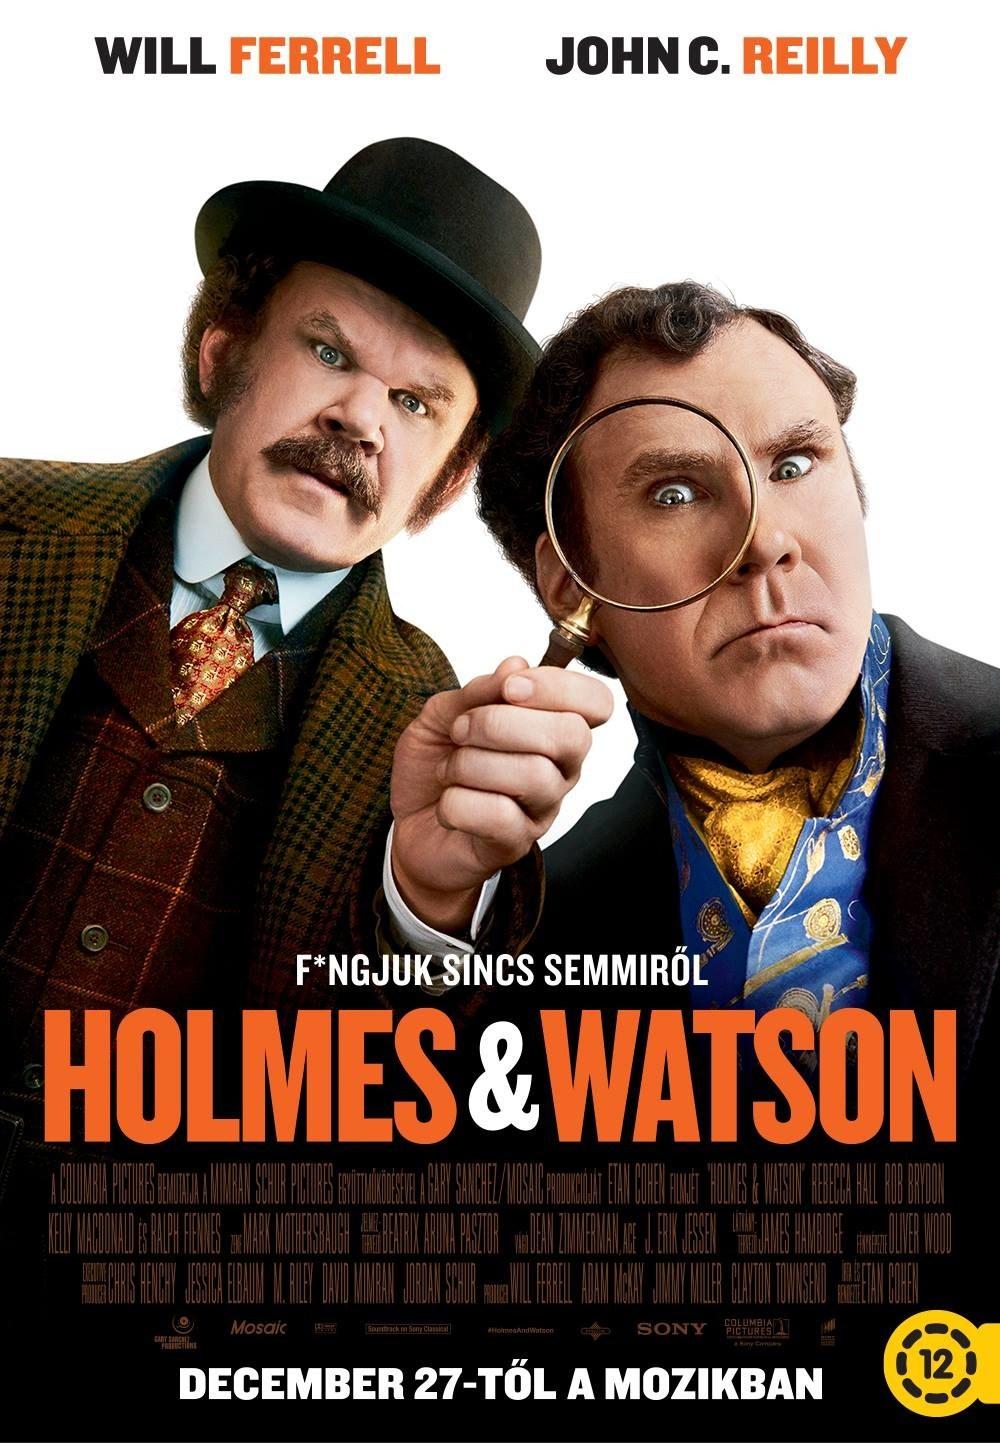 Holmes e Watson Torrent Baixar